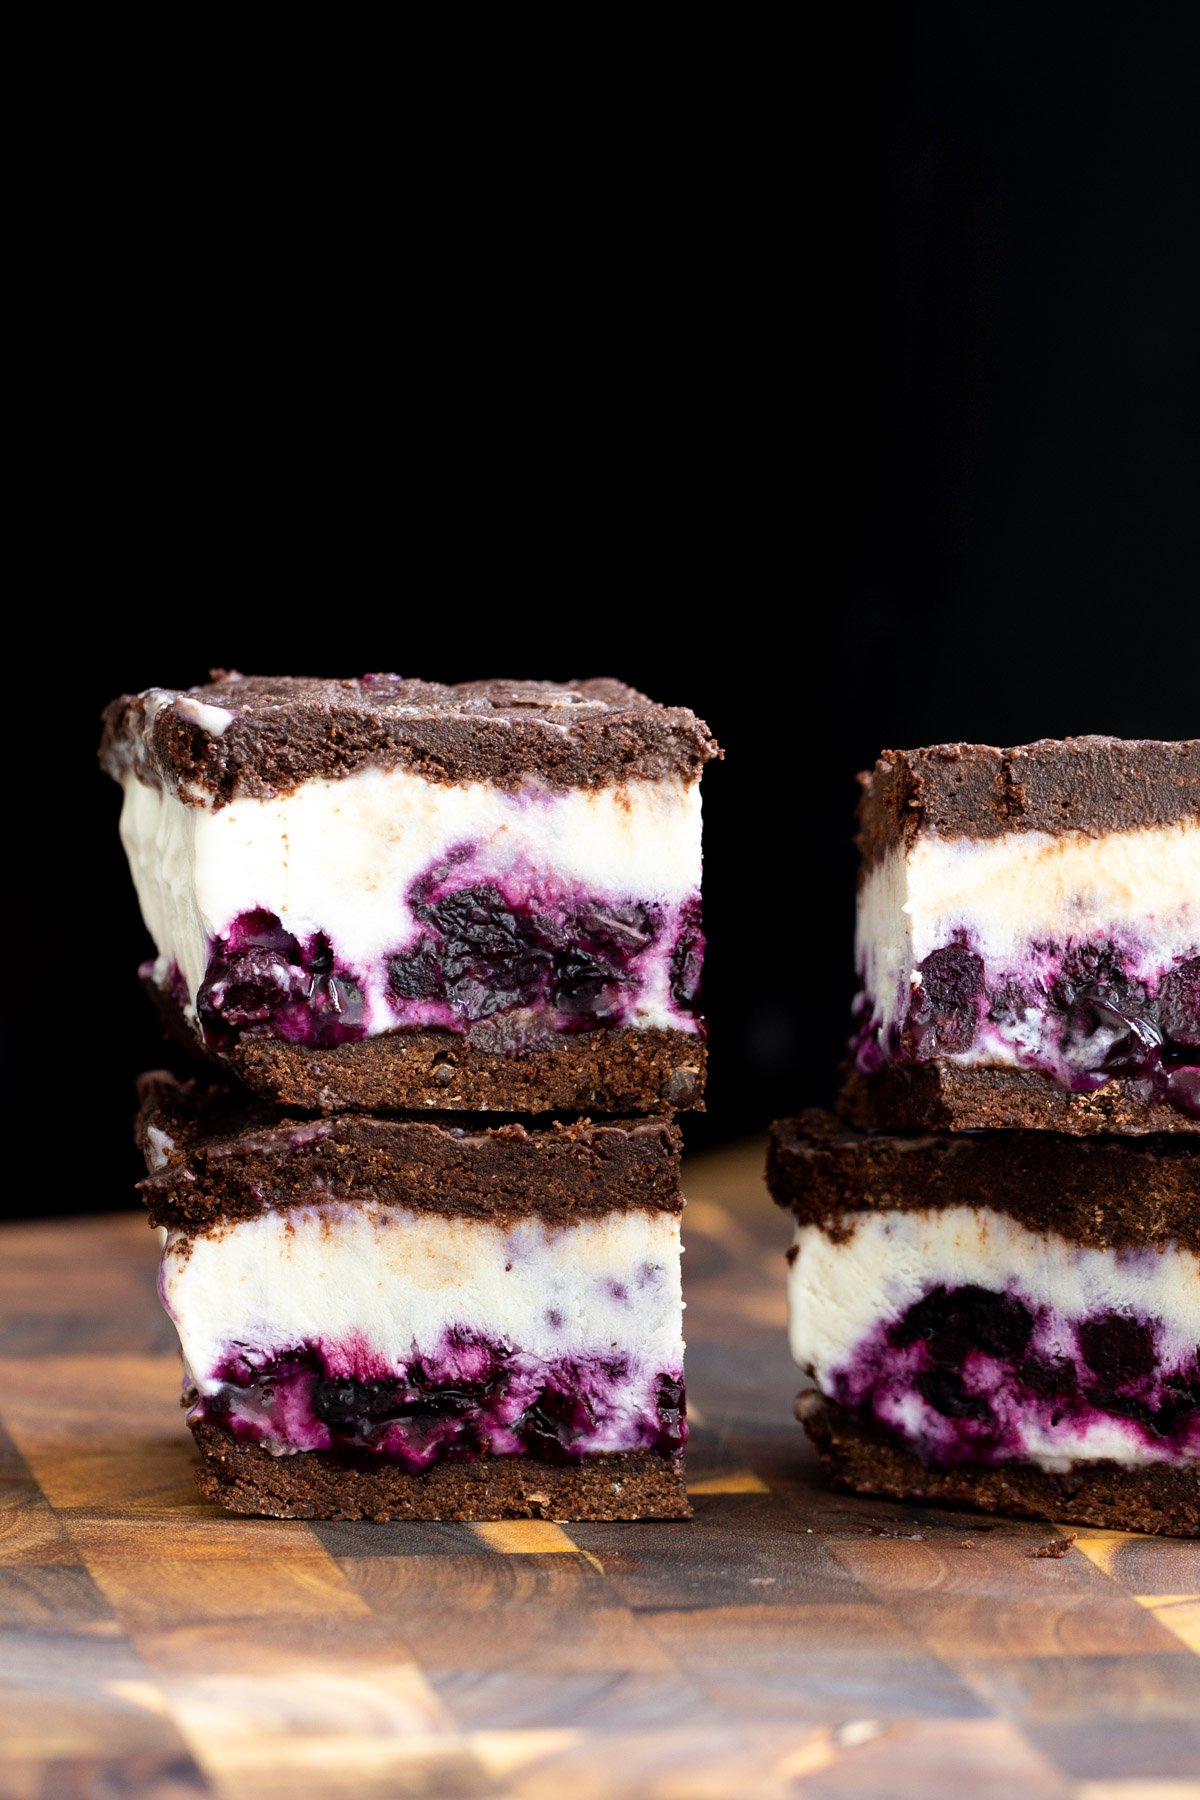 vegan vanilla blueberry swirl ice cream sandwiches on a chopping board